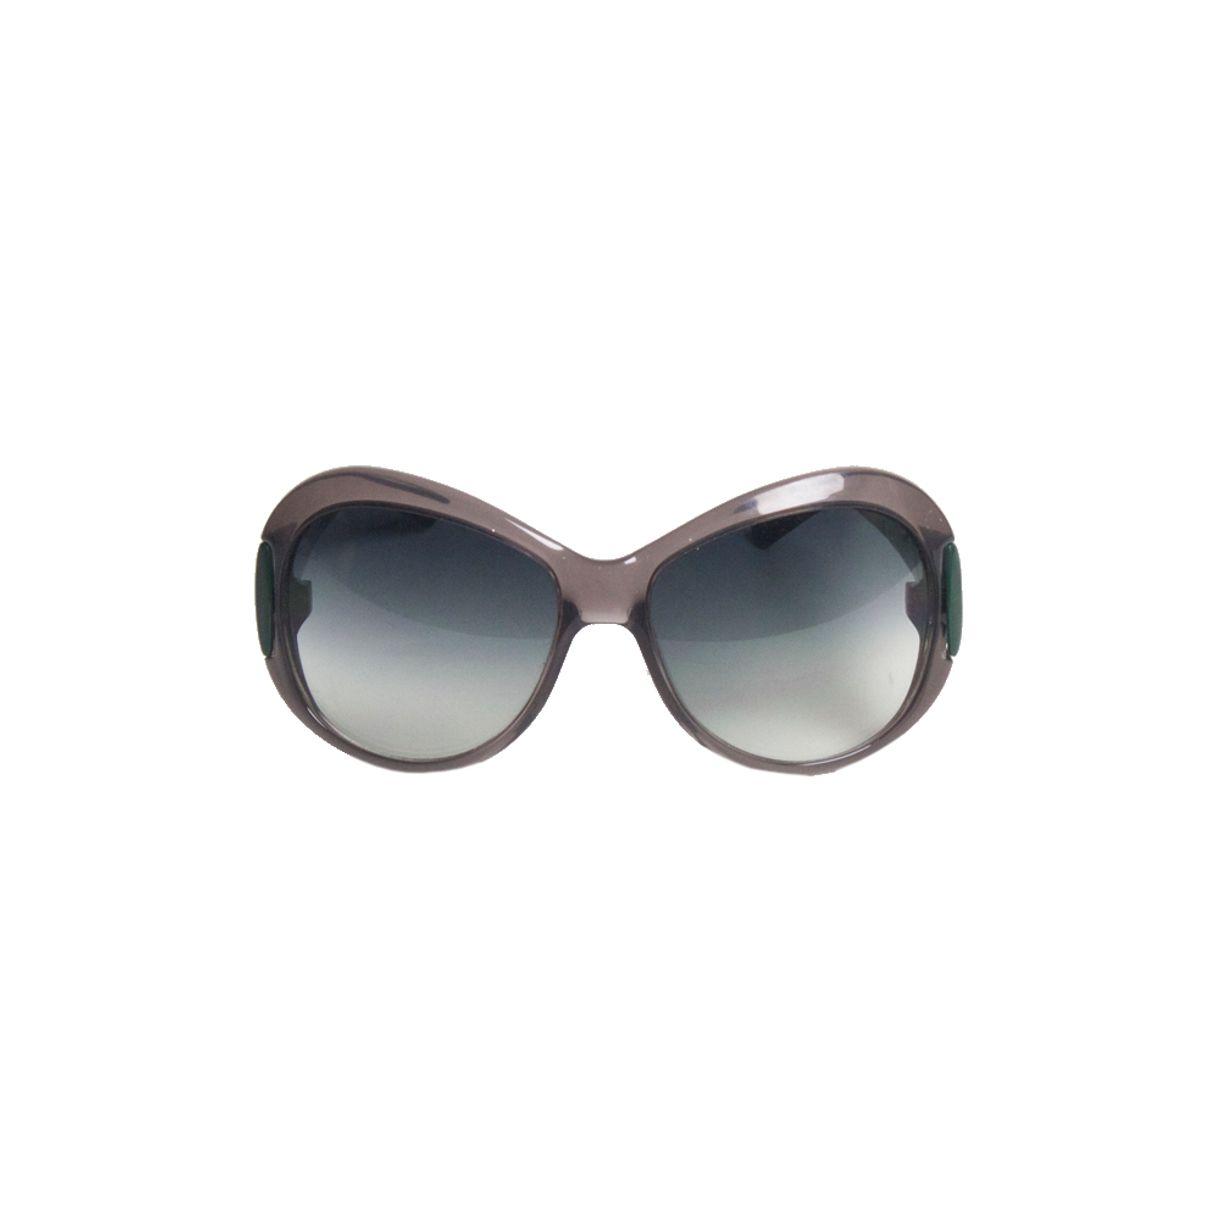 Oculos-Marc-Jacobs-Cinza-e-Verde